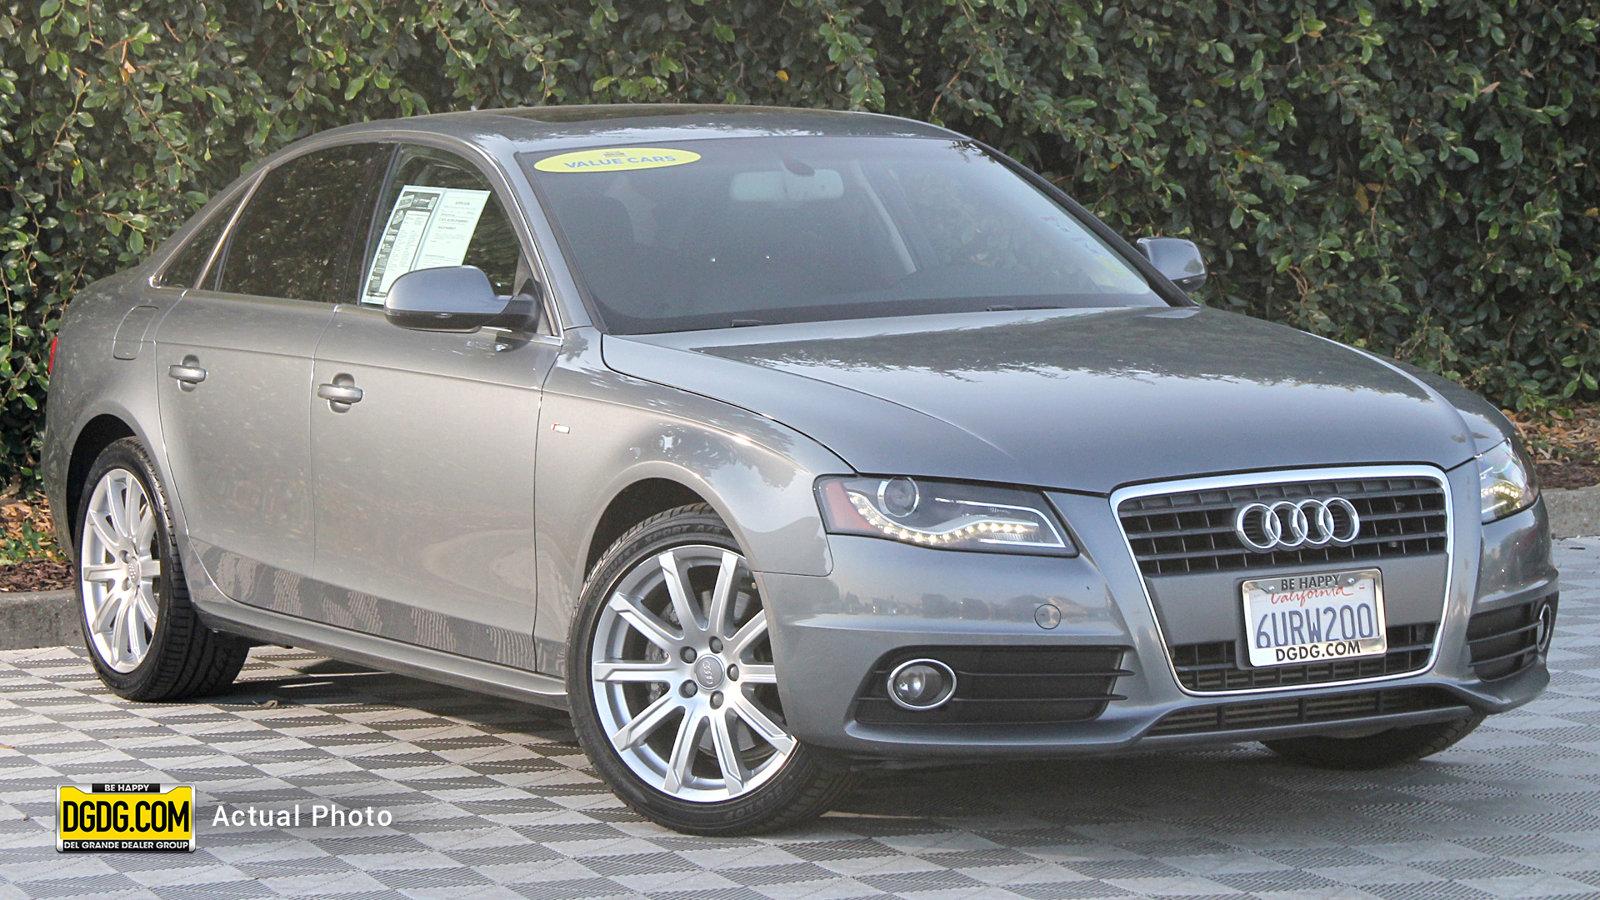 Pre-Owned 2012 Audi A4 2.0T Premium Plus